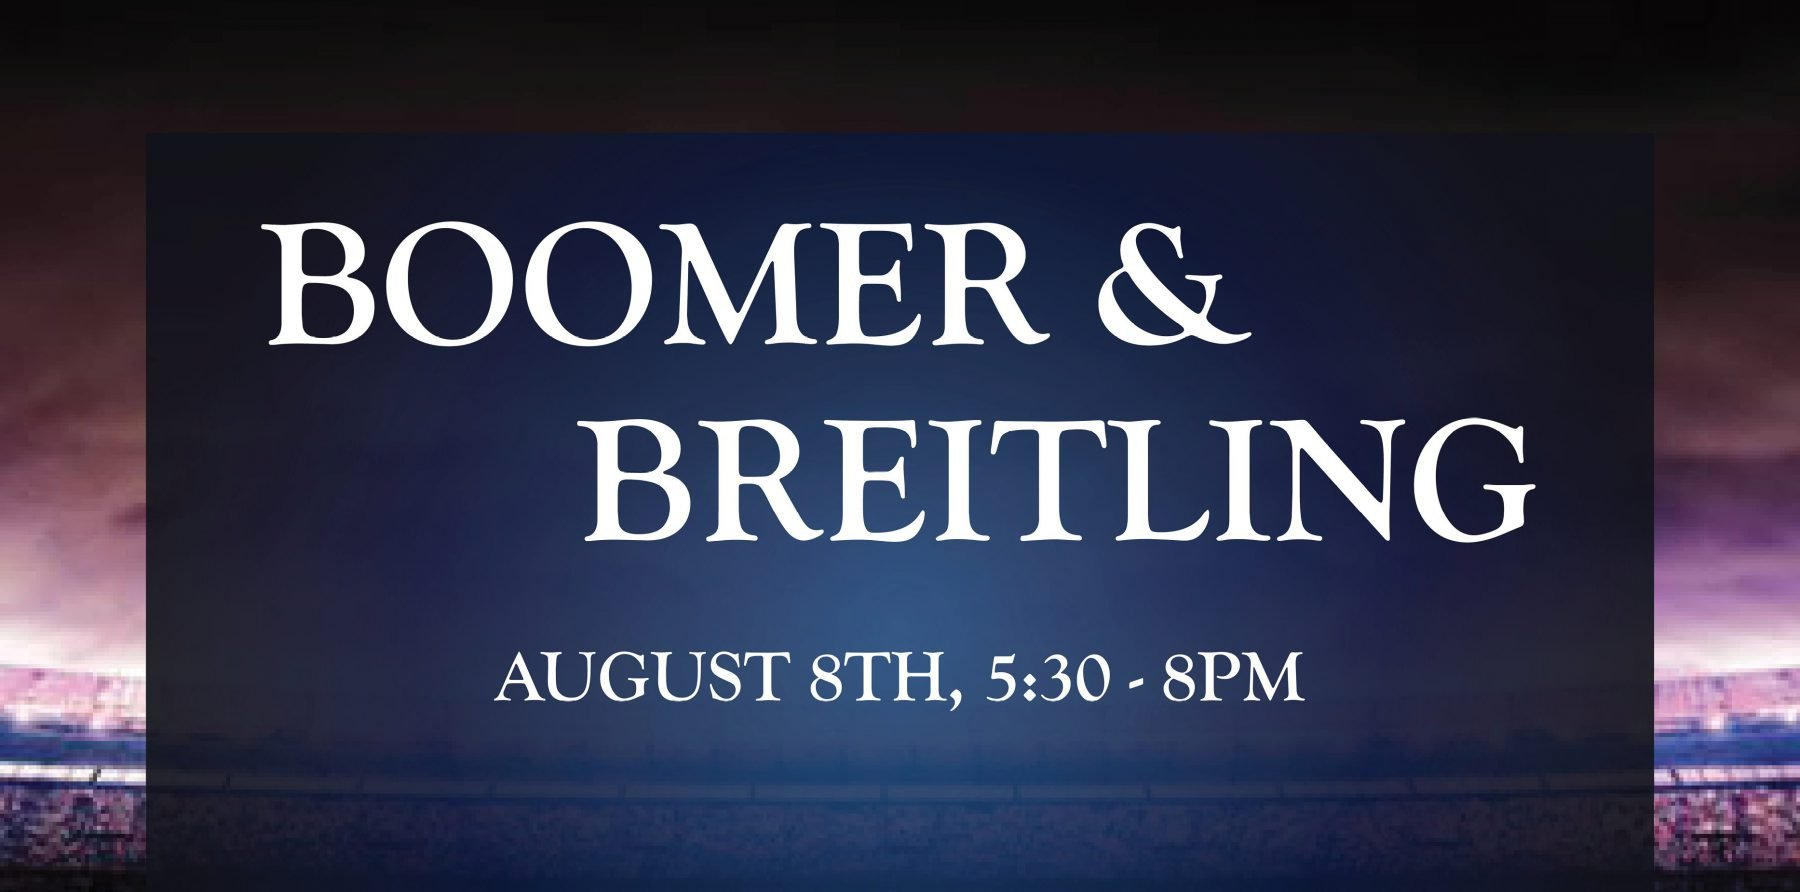 Boomer & Breitling